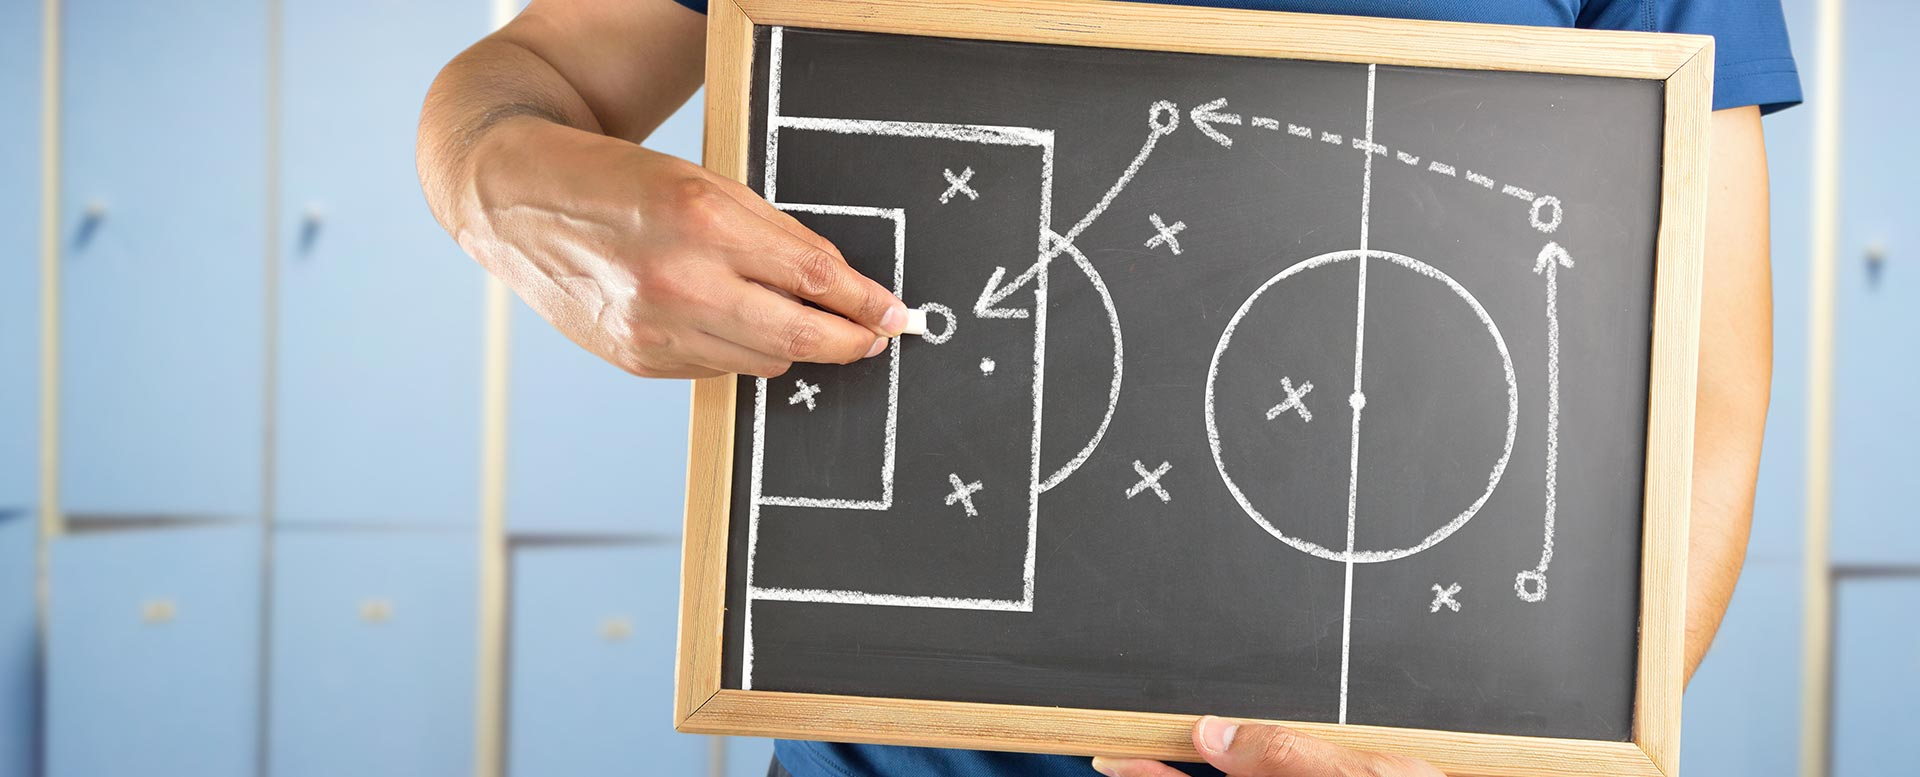 Fußballtrainer erklärt Taktik